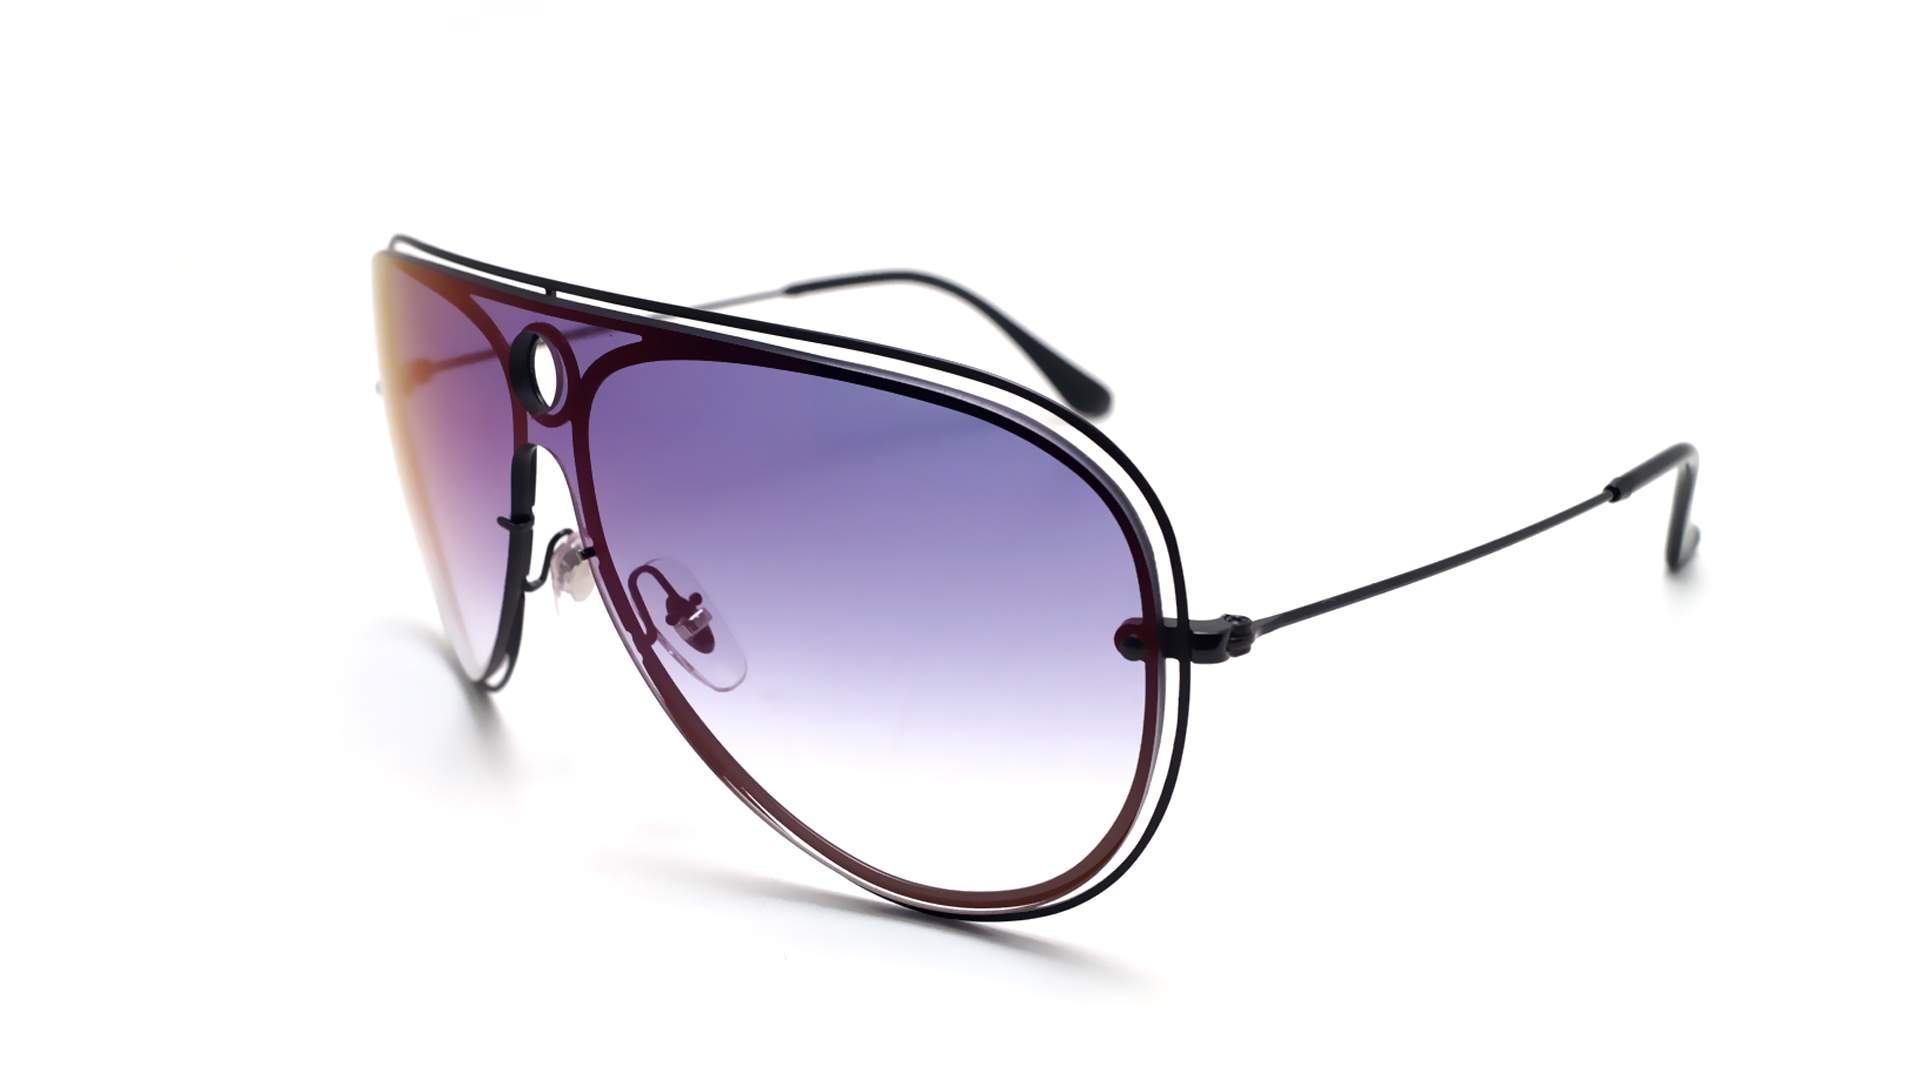 5b25694a2d Sunglasses Ray-Ban Shooter Blaze Black RB3605N 186 X0 32-20 Medium Gradient  Mirror